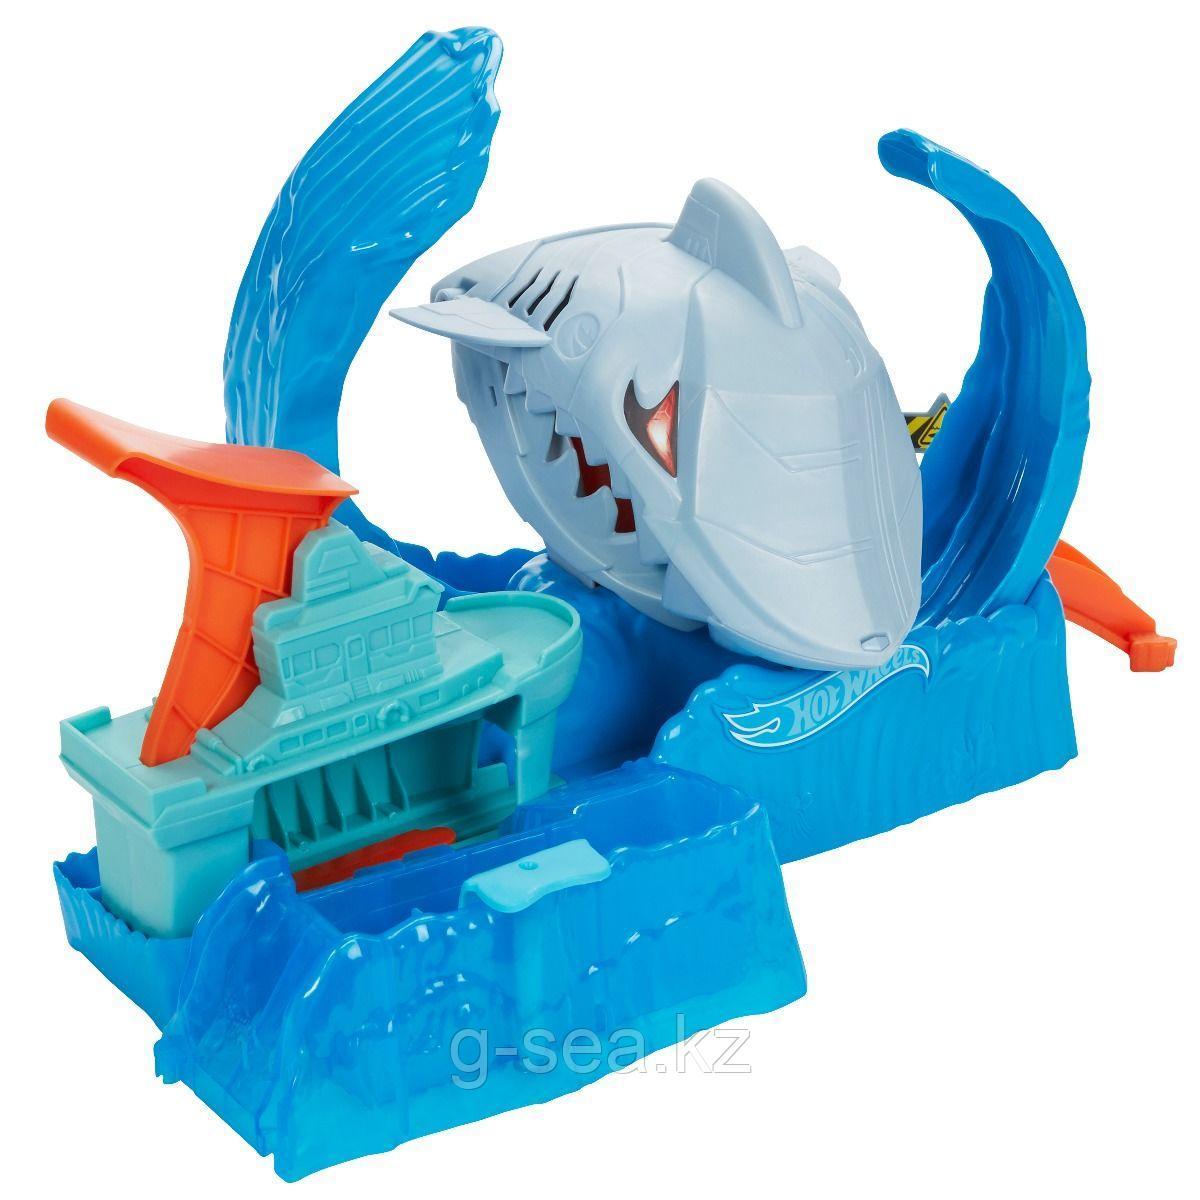 Hot Wheels: City. Игровой набор Ледяная акула